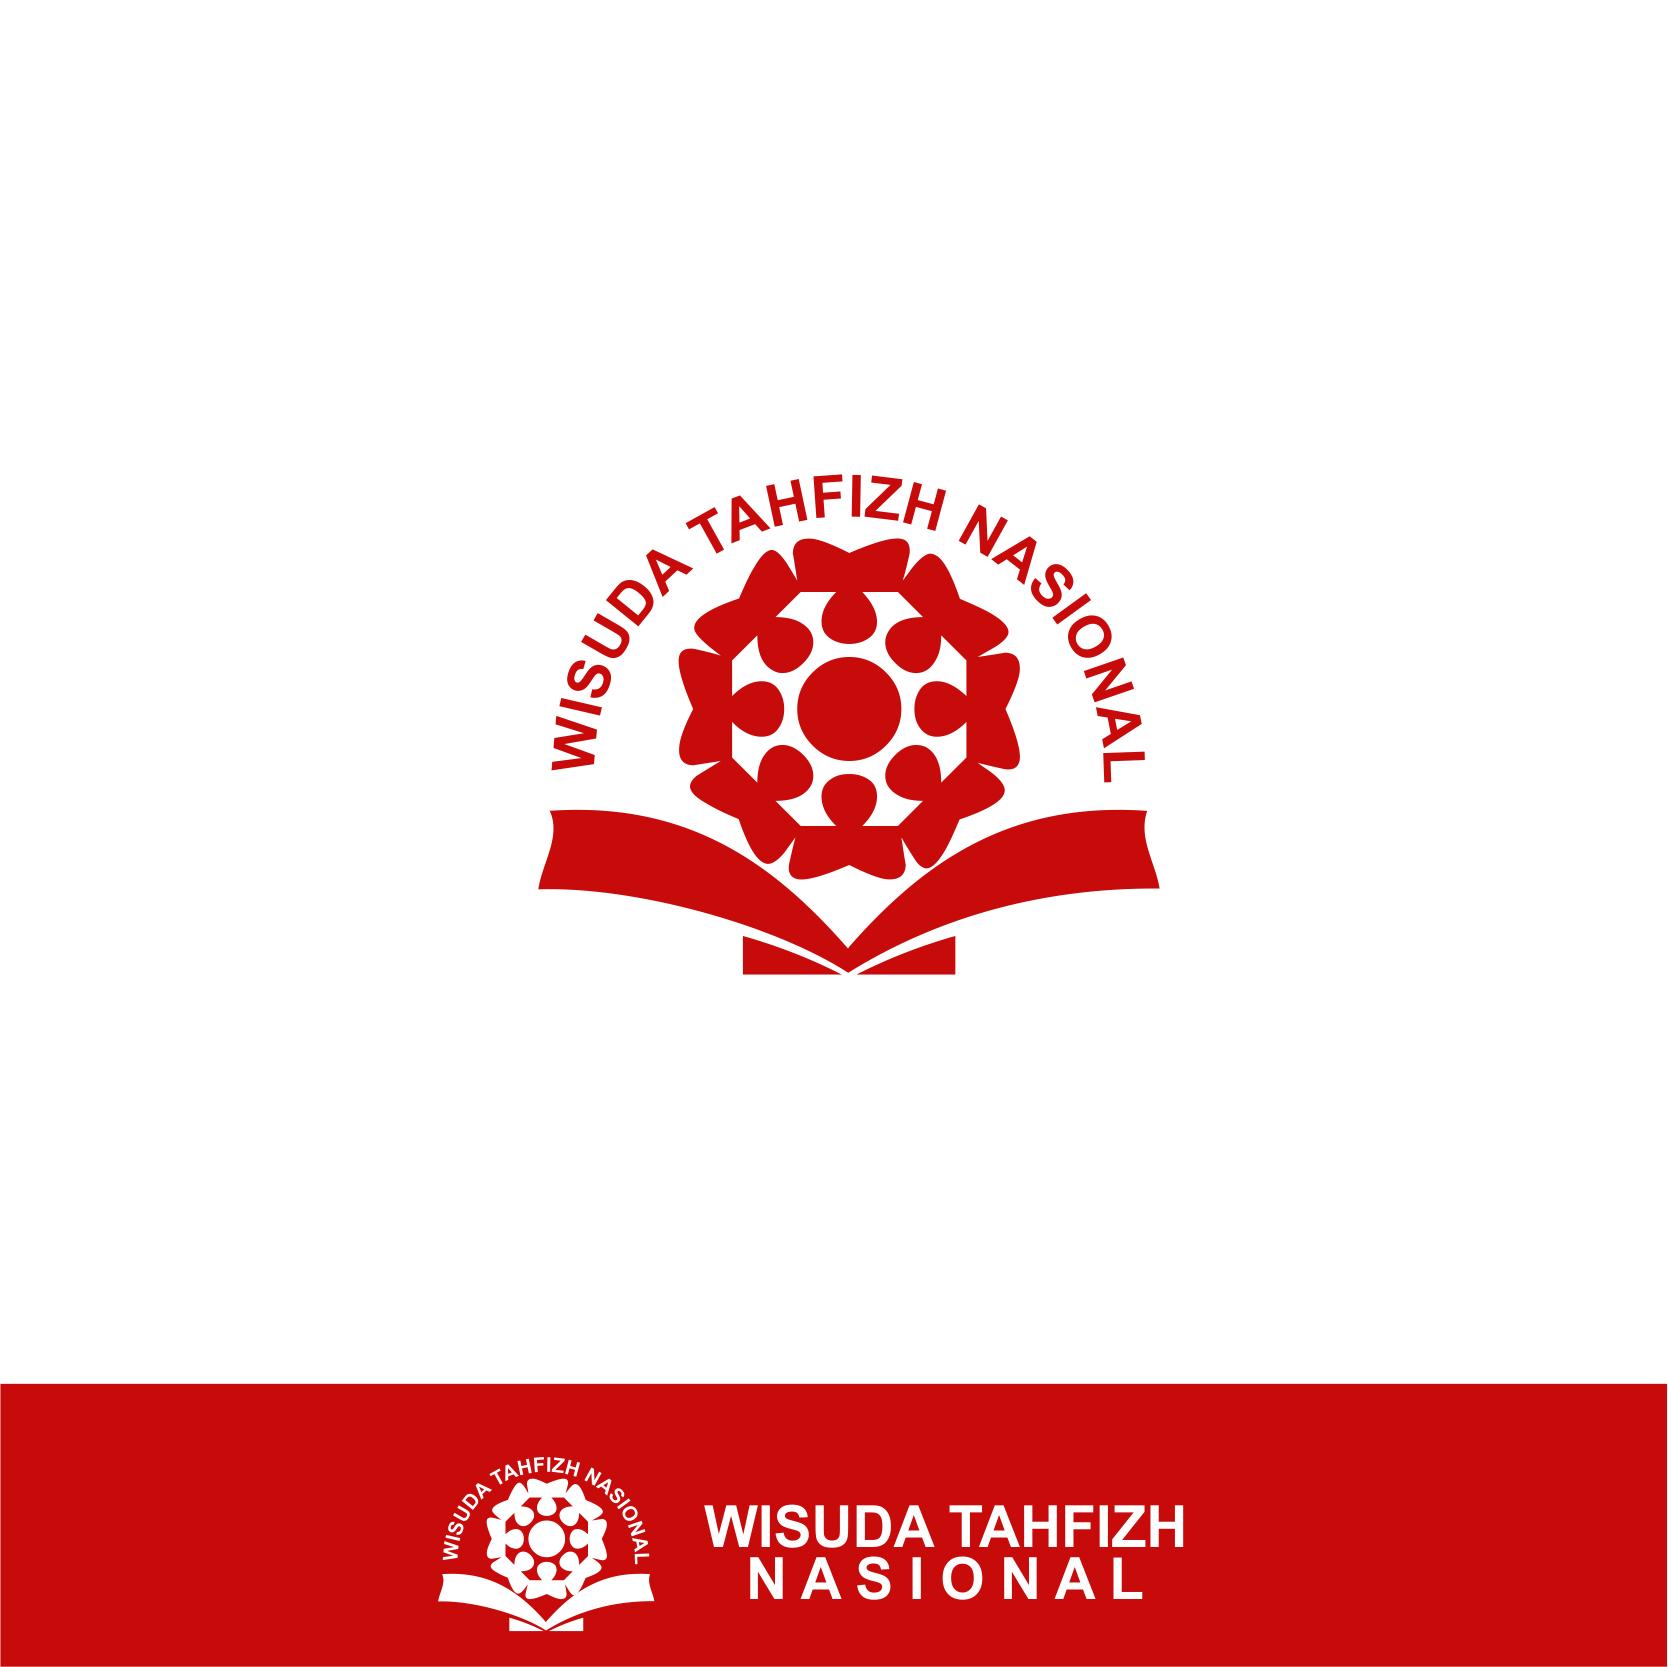 Design banner wisuda - See More Designs